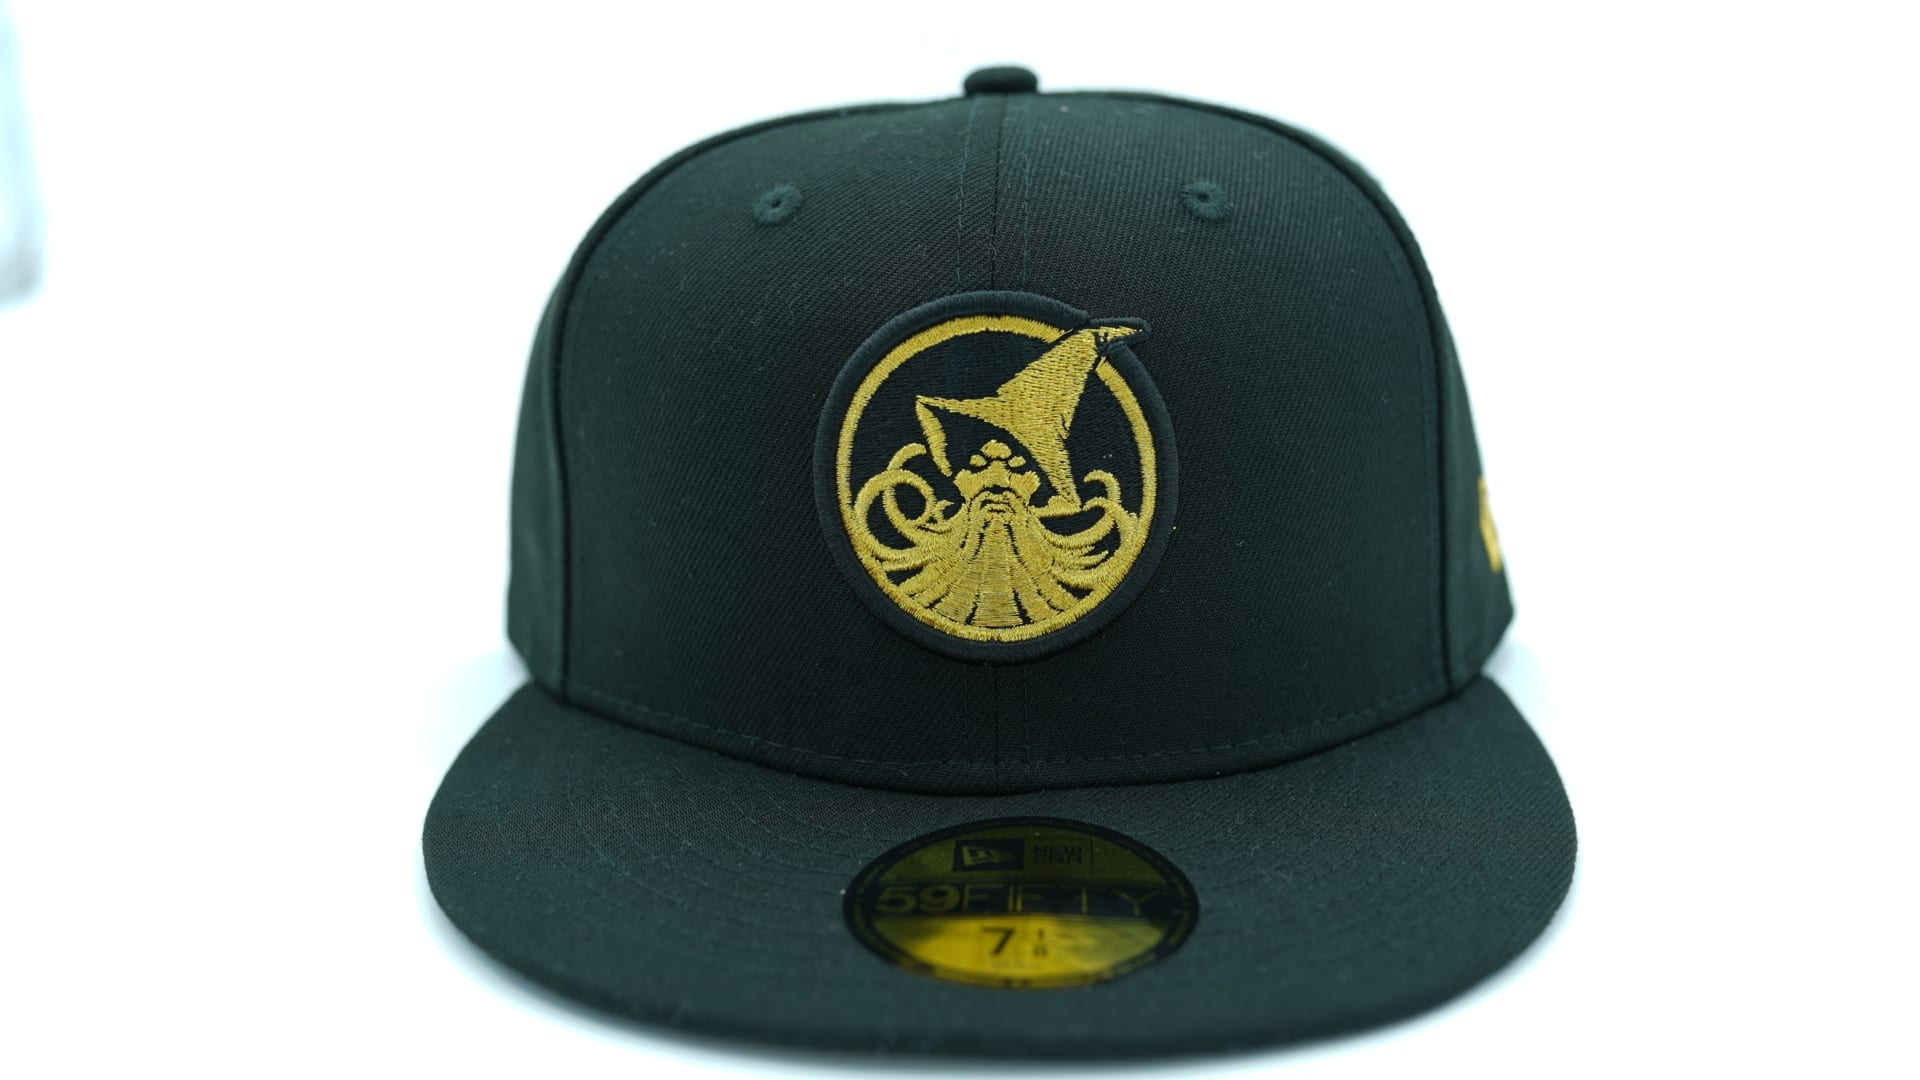 nfl fitted baseball caps cheap hats wholesale raiders salute service cap era